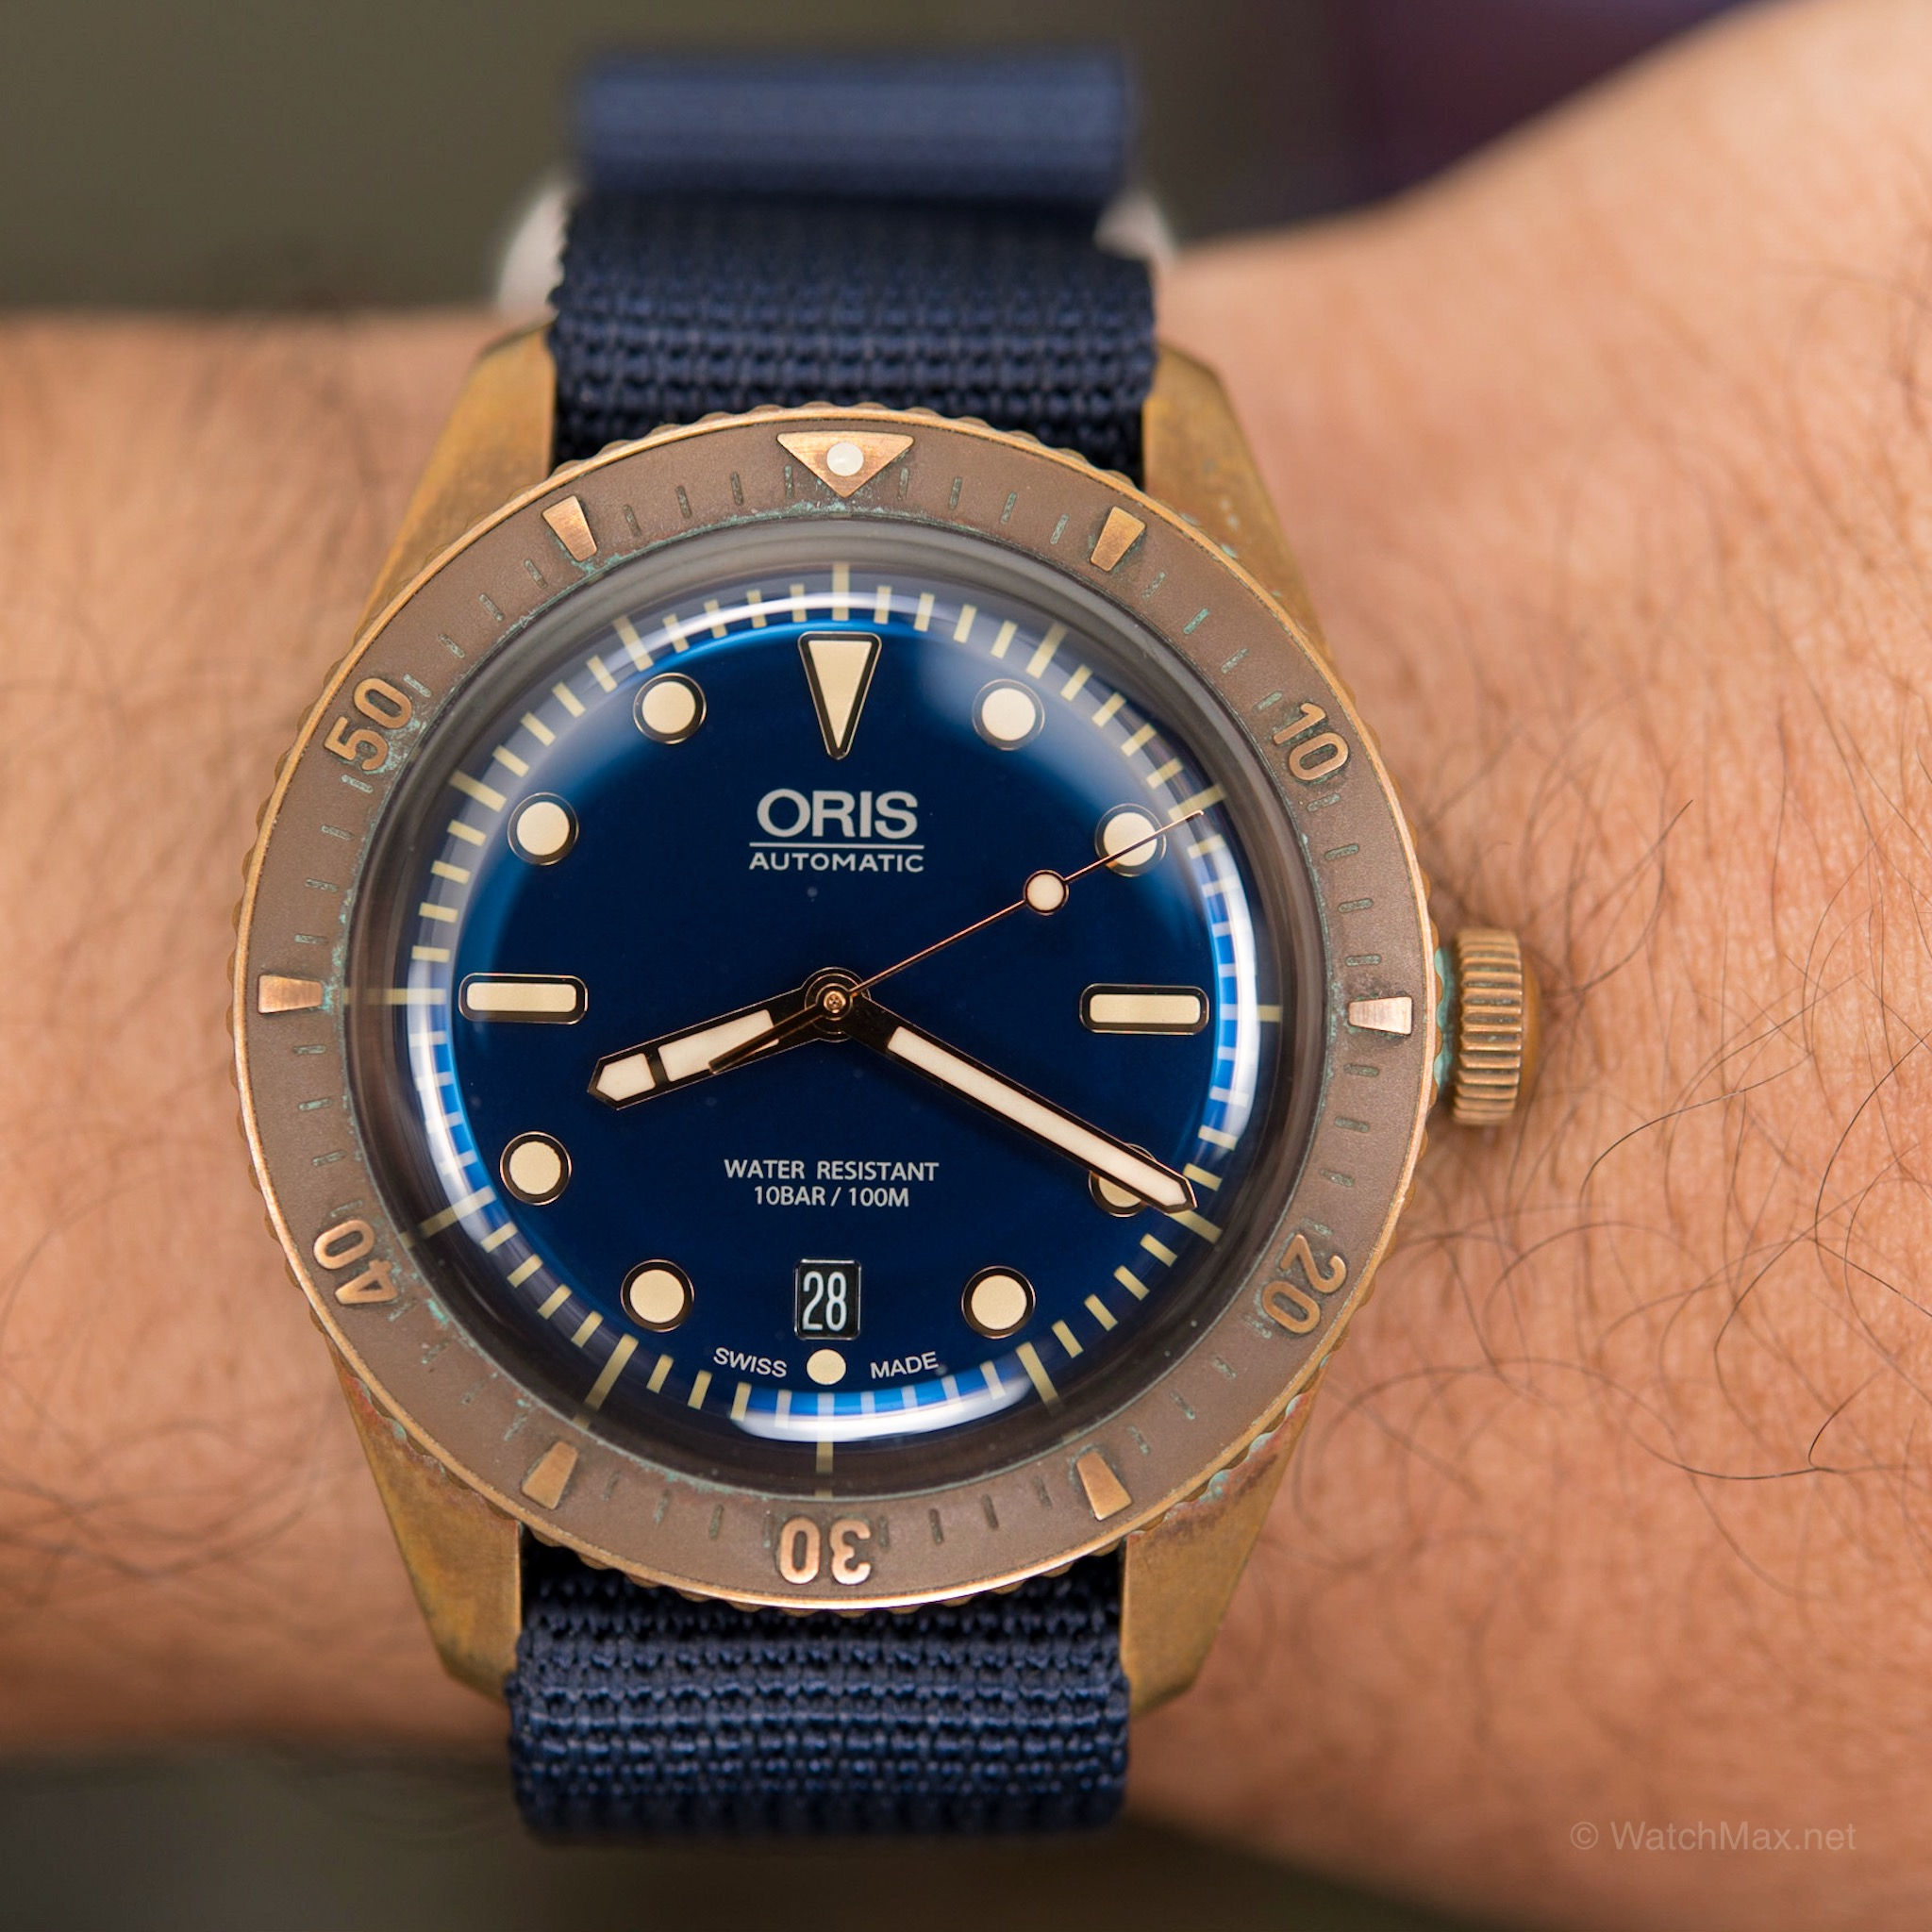 oris-diver-sixtyfive-carl-brashear-limited-edition-2.JPG